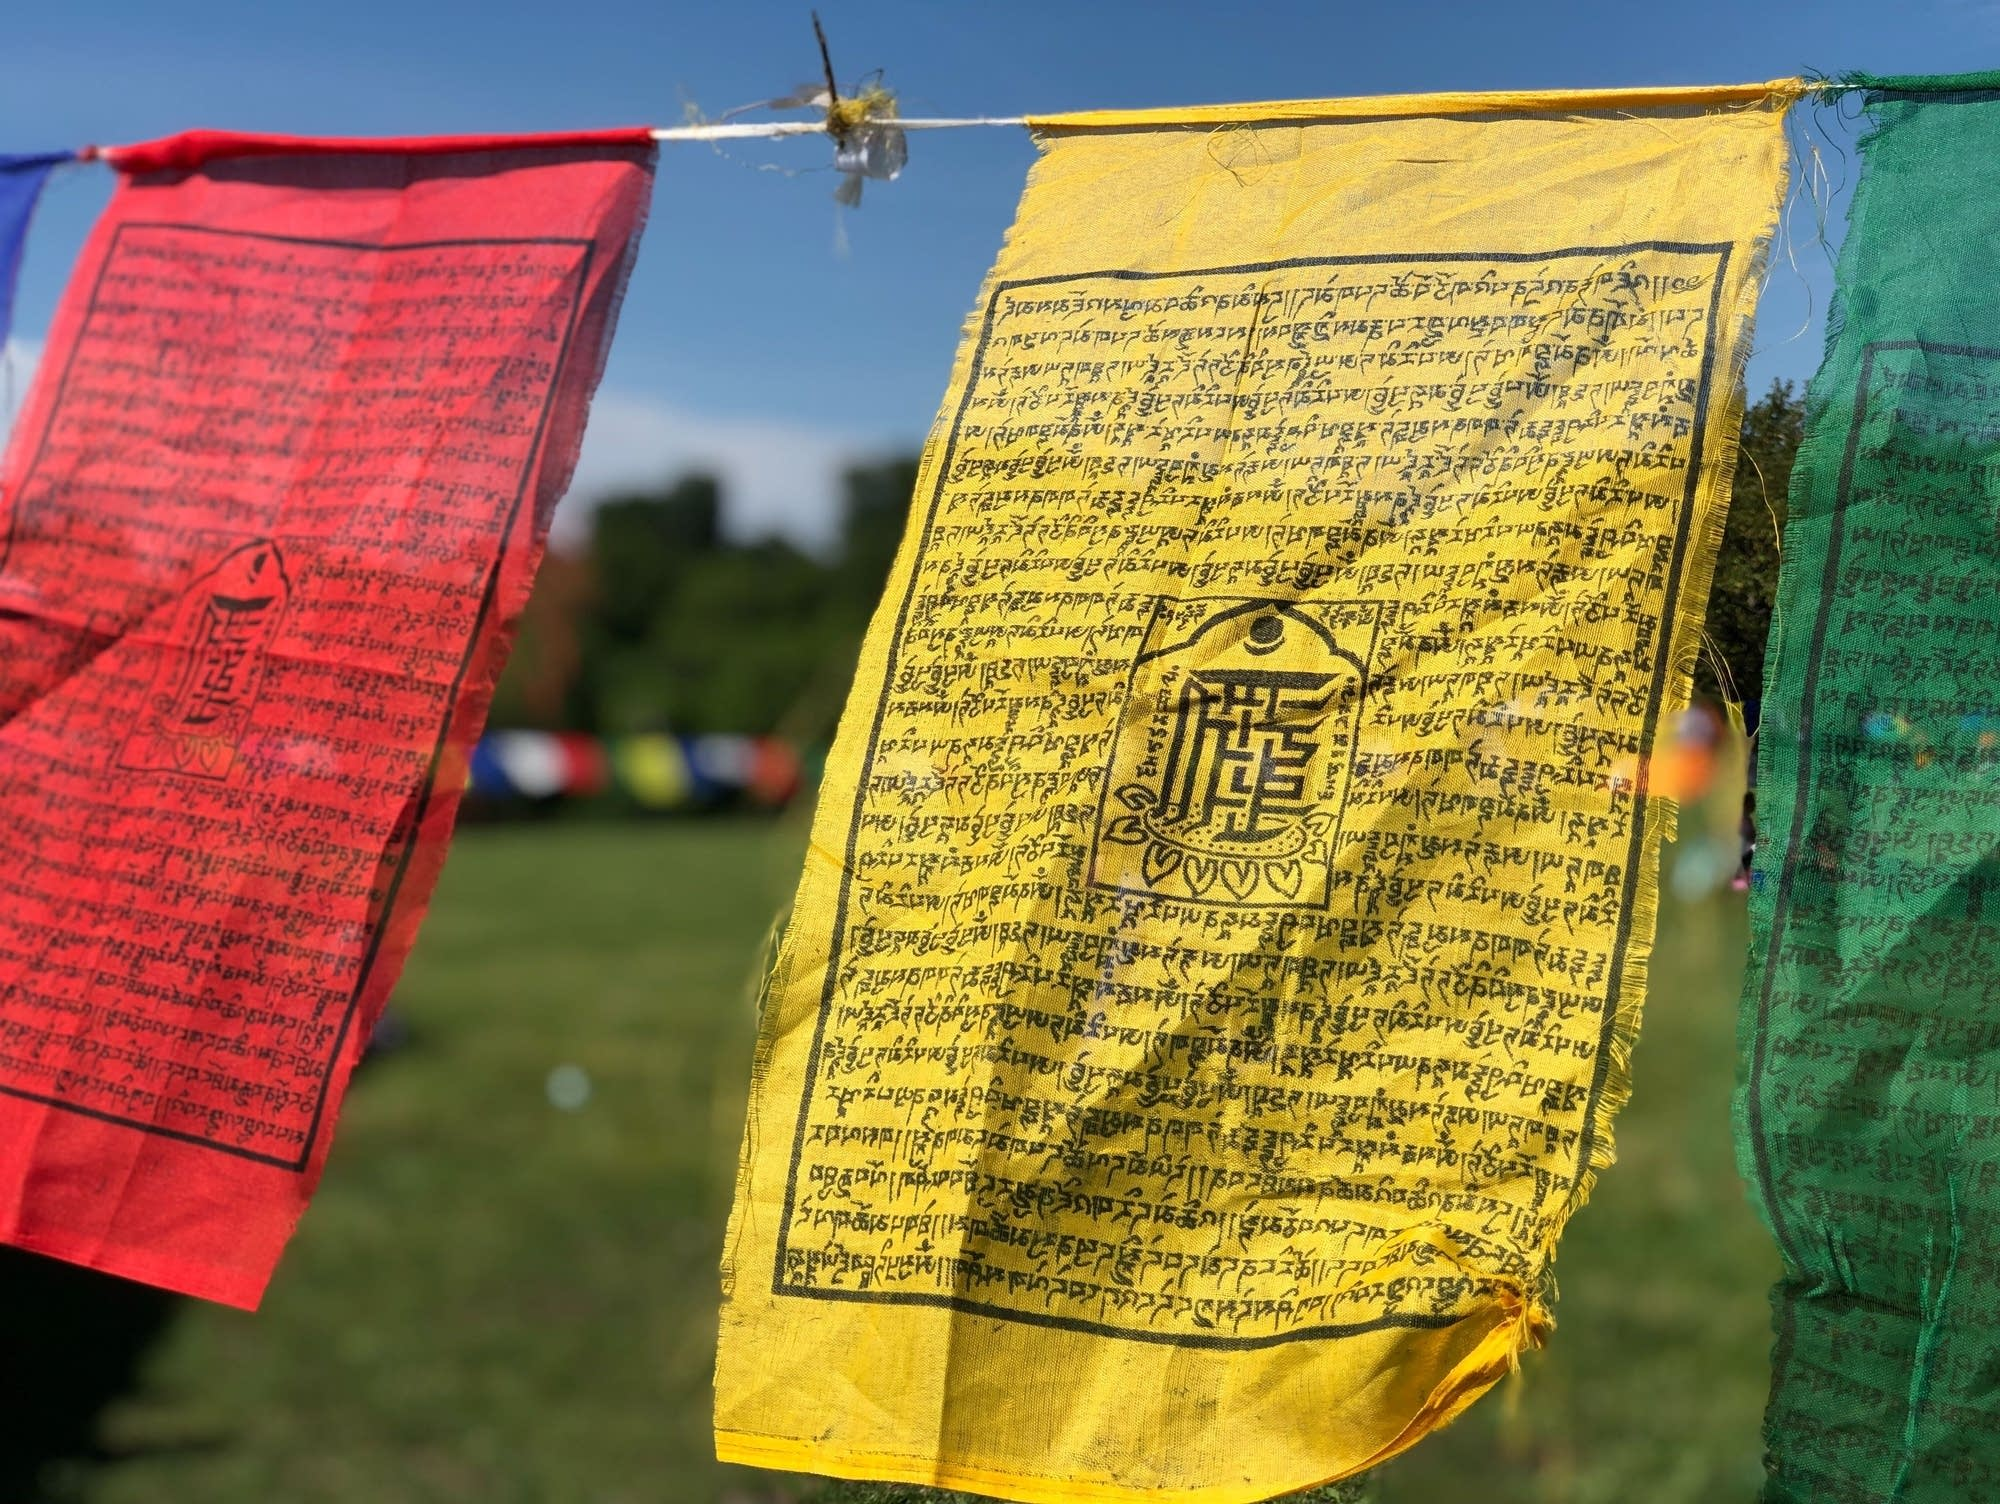 Tibetan-Americans gather in Minneapolis to celebrate culture, community